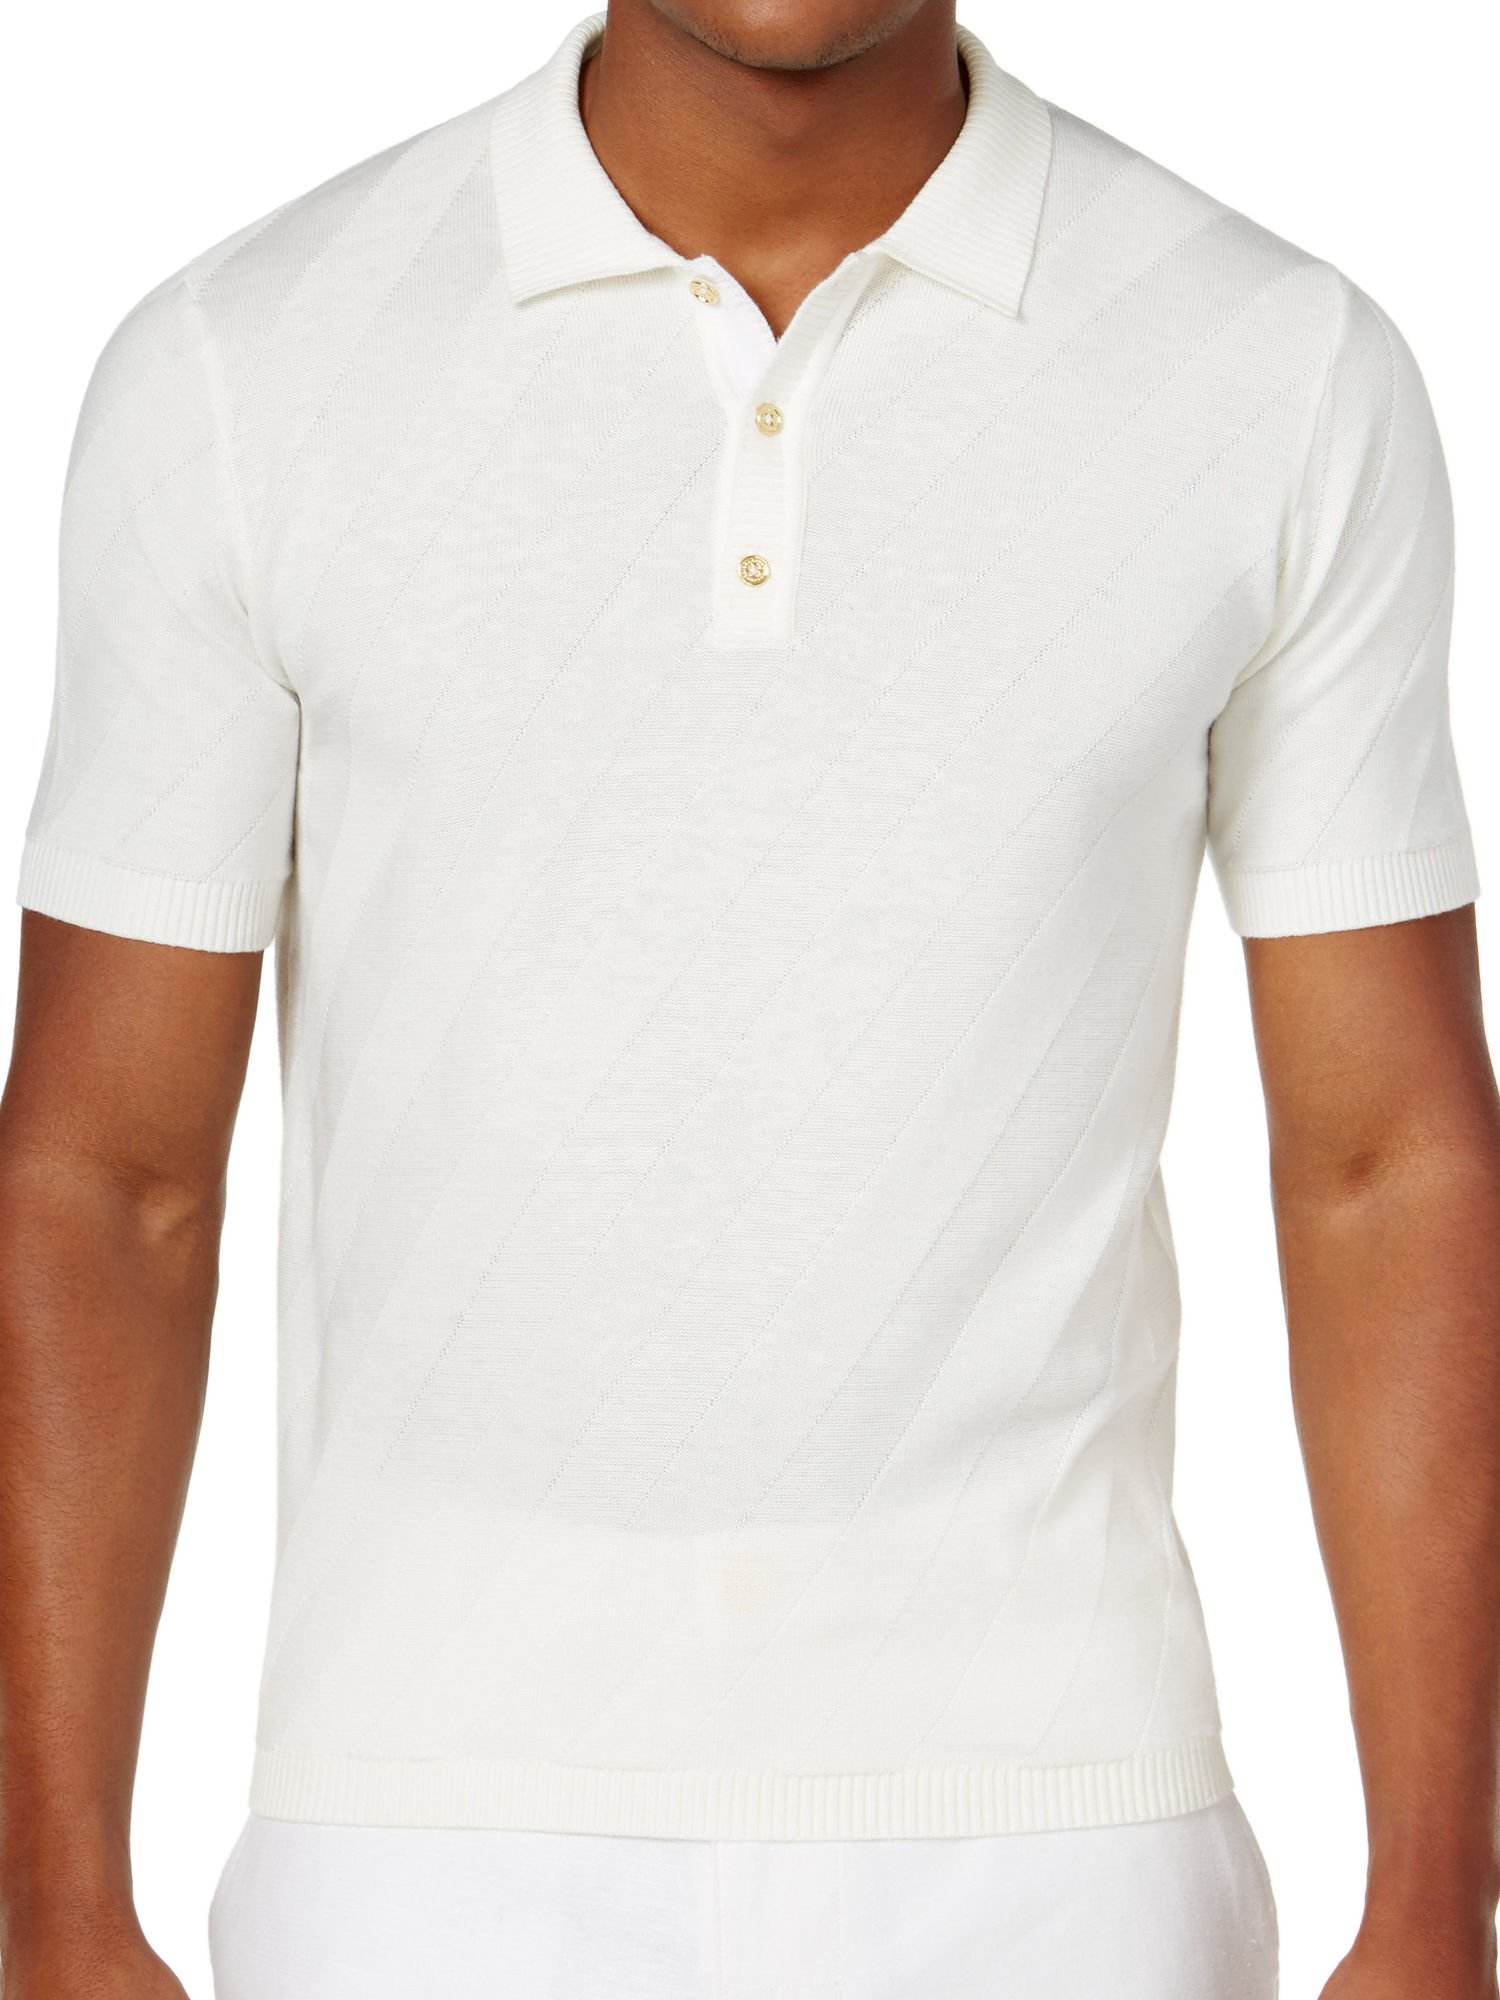 Sean John Men's Jacquard Stripe Sweater Polo (Large, Cream)